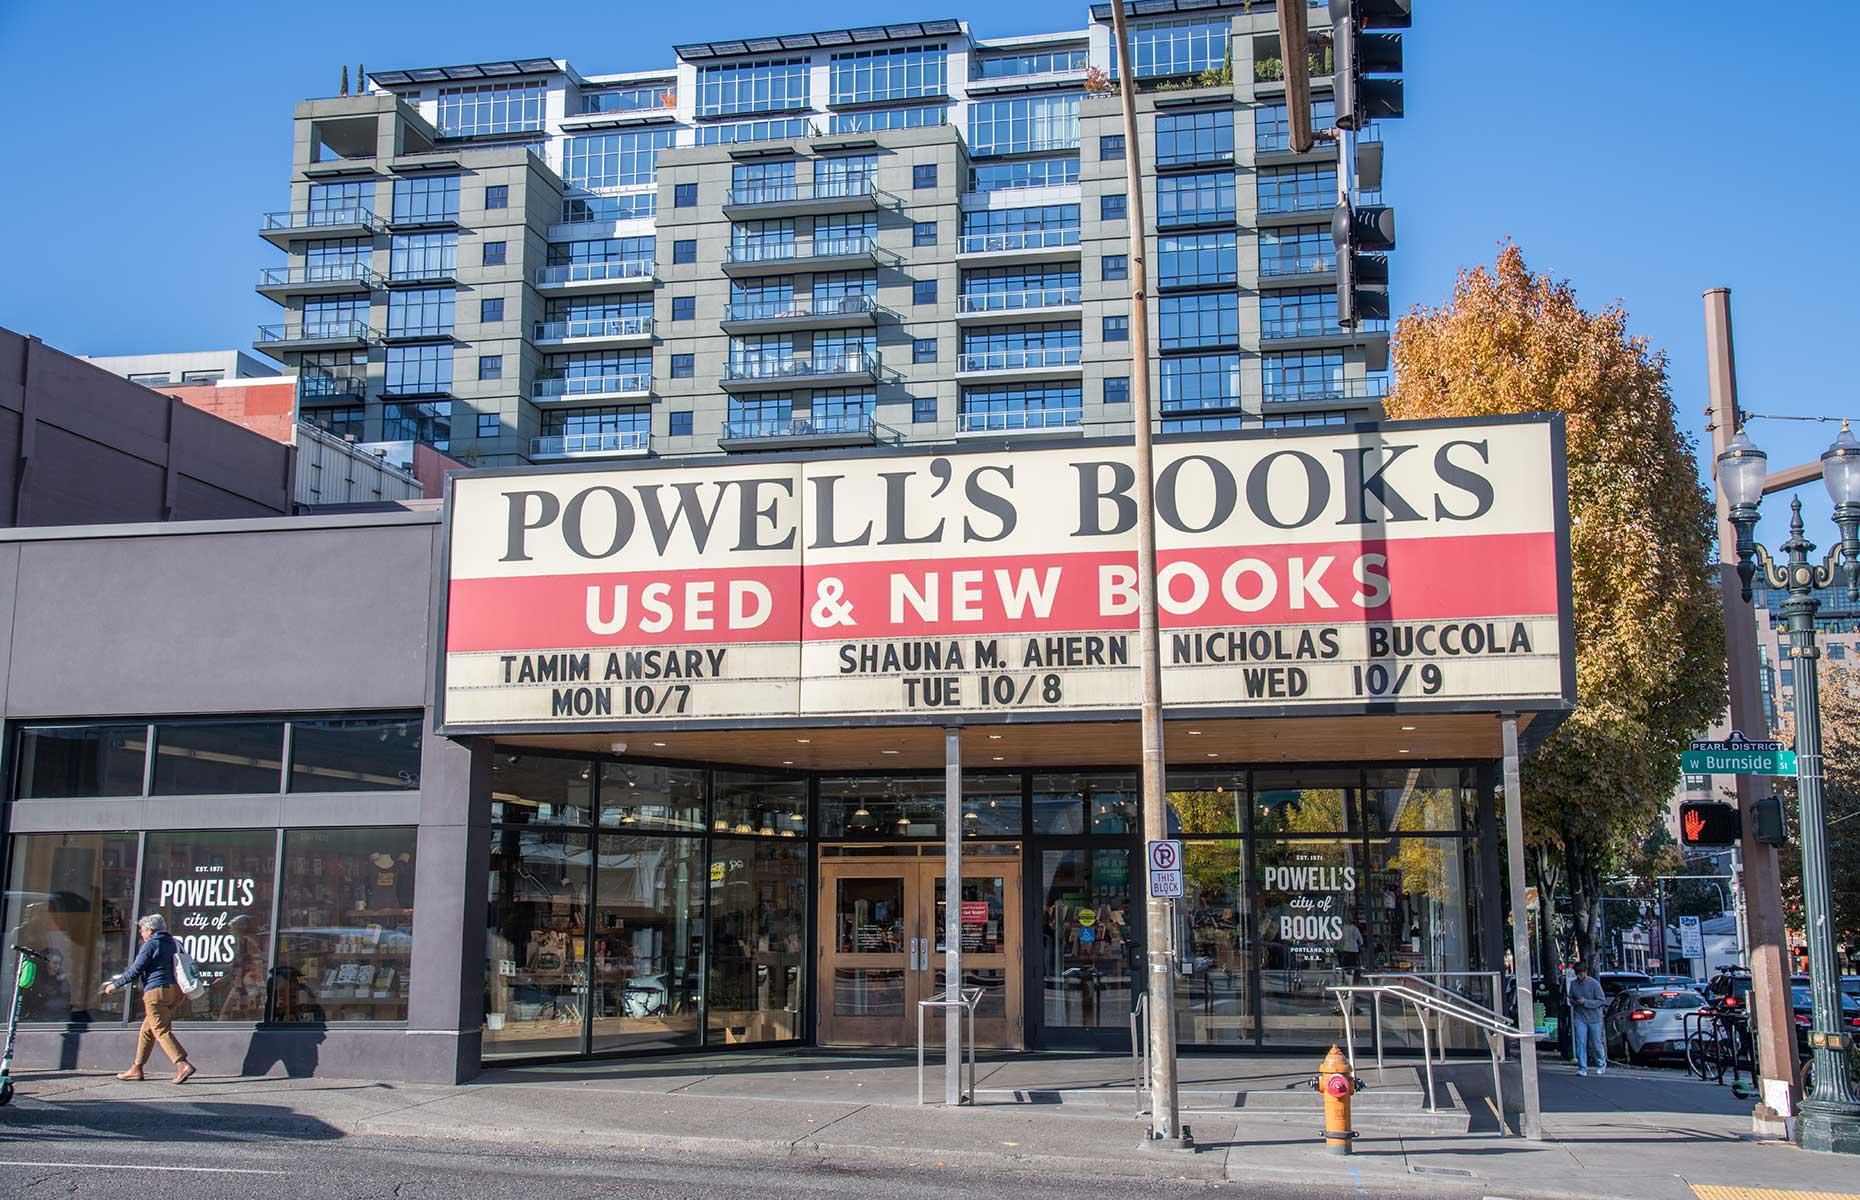 Powell's City Of Books, Portland Oregon (Image: Michael Gordon/Shutterstock)